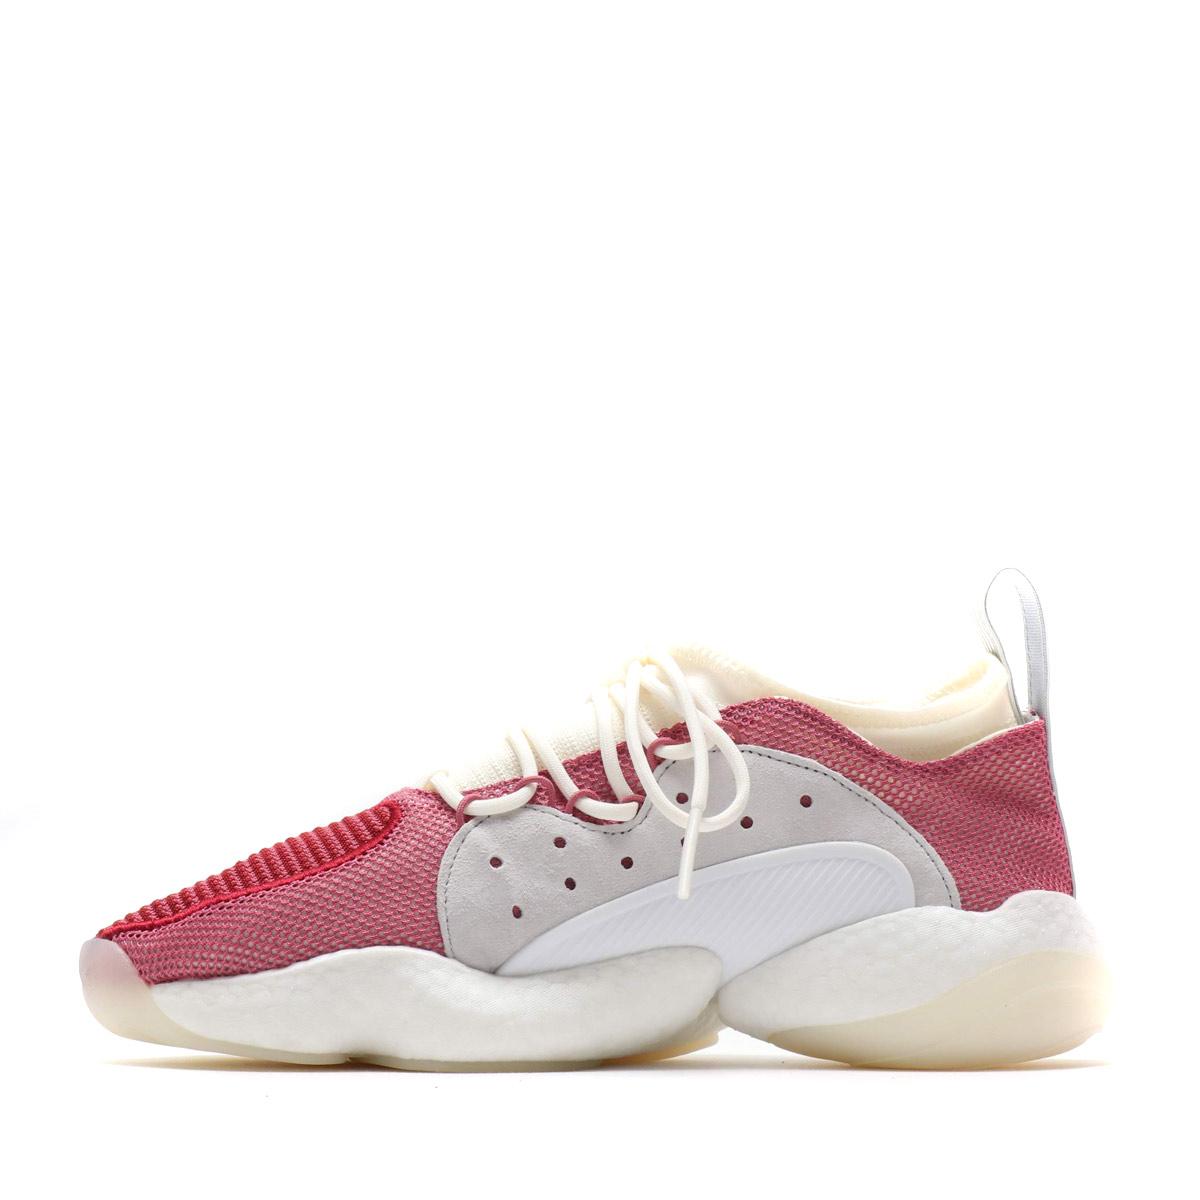 brand new 51178 42755 adidas Originals CRAZY BYW LVL II (Adidas originals crazy BYW LVL1) TRASE  MAROONCLOUD WHITECLEAR ORANGE 18FW-I